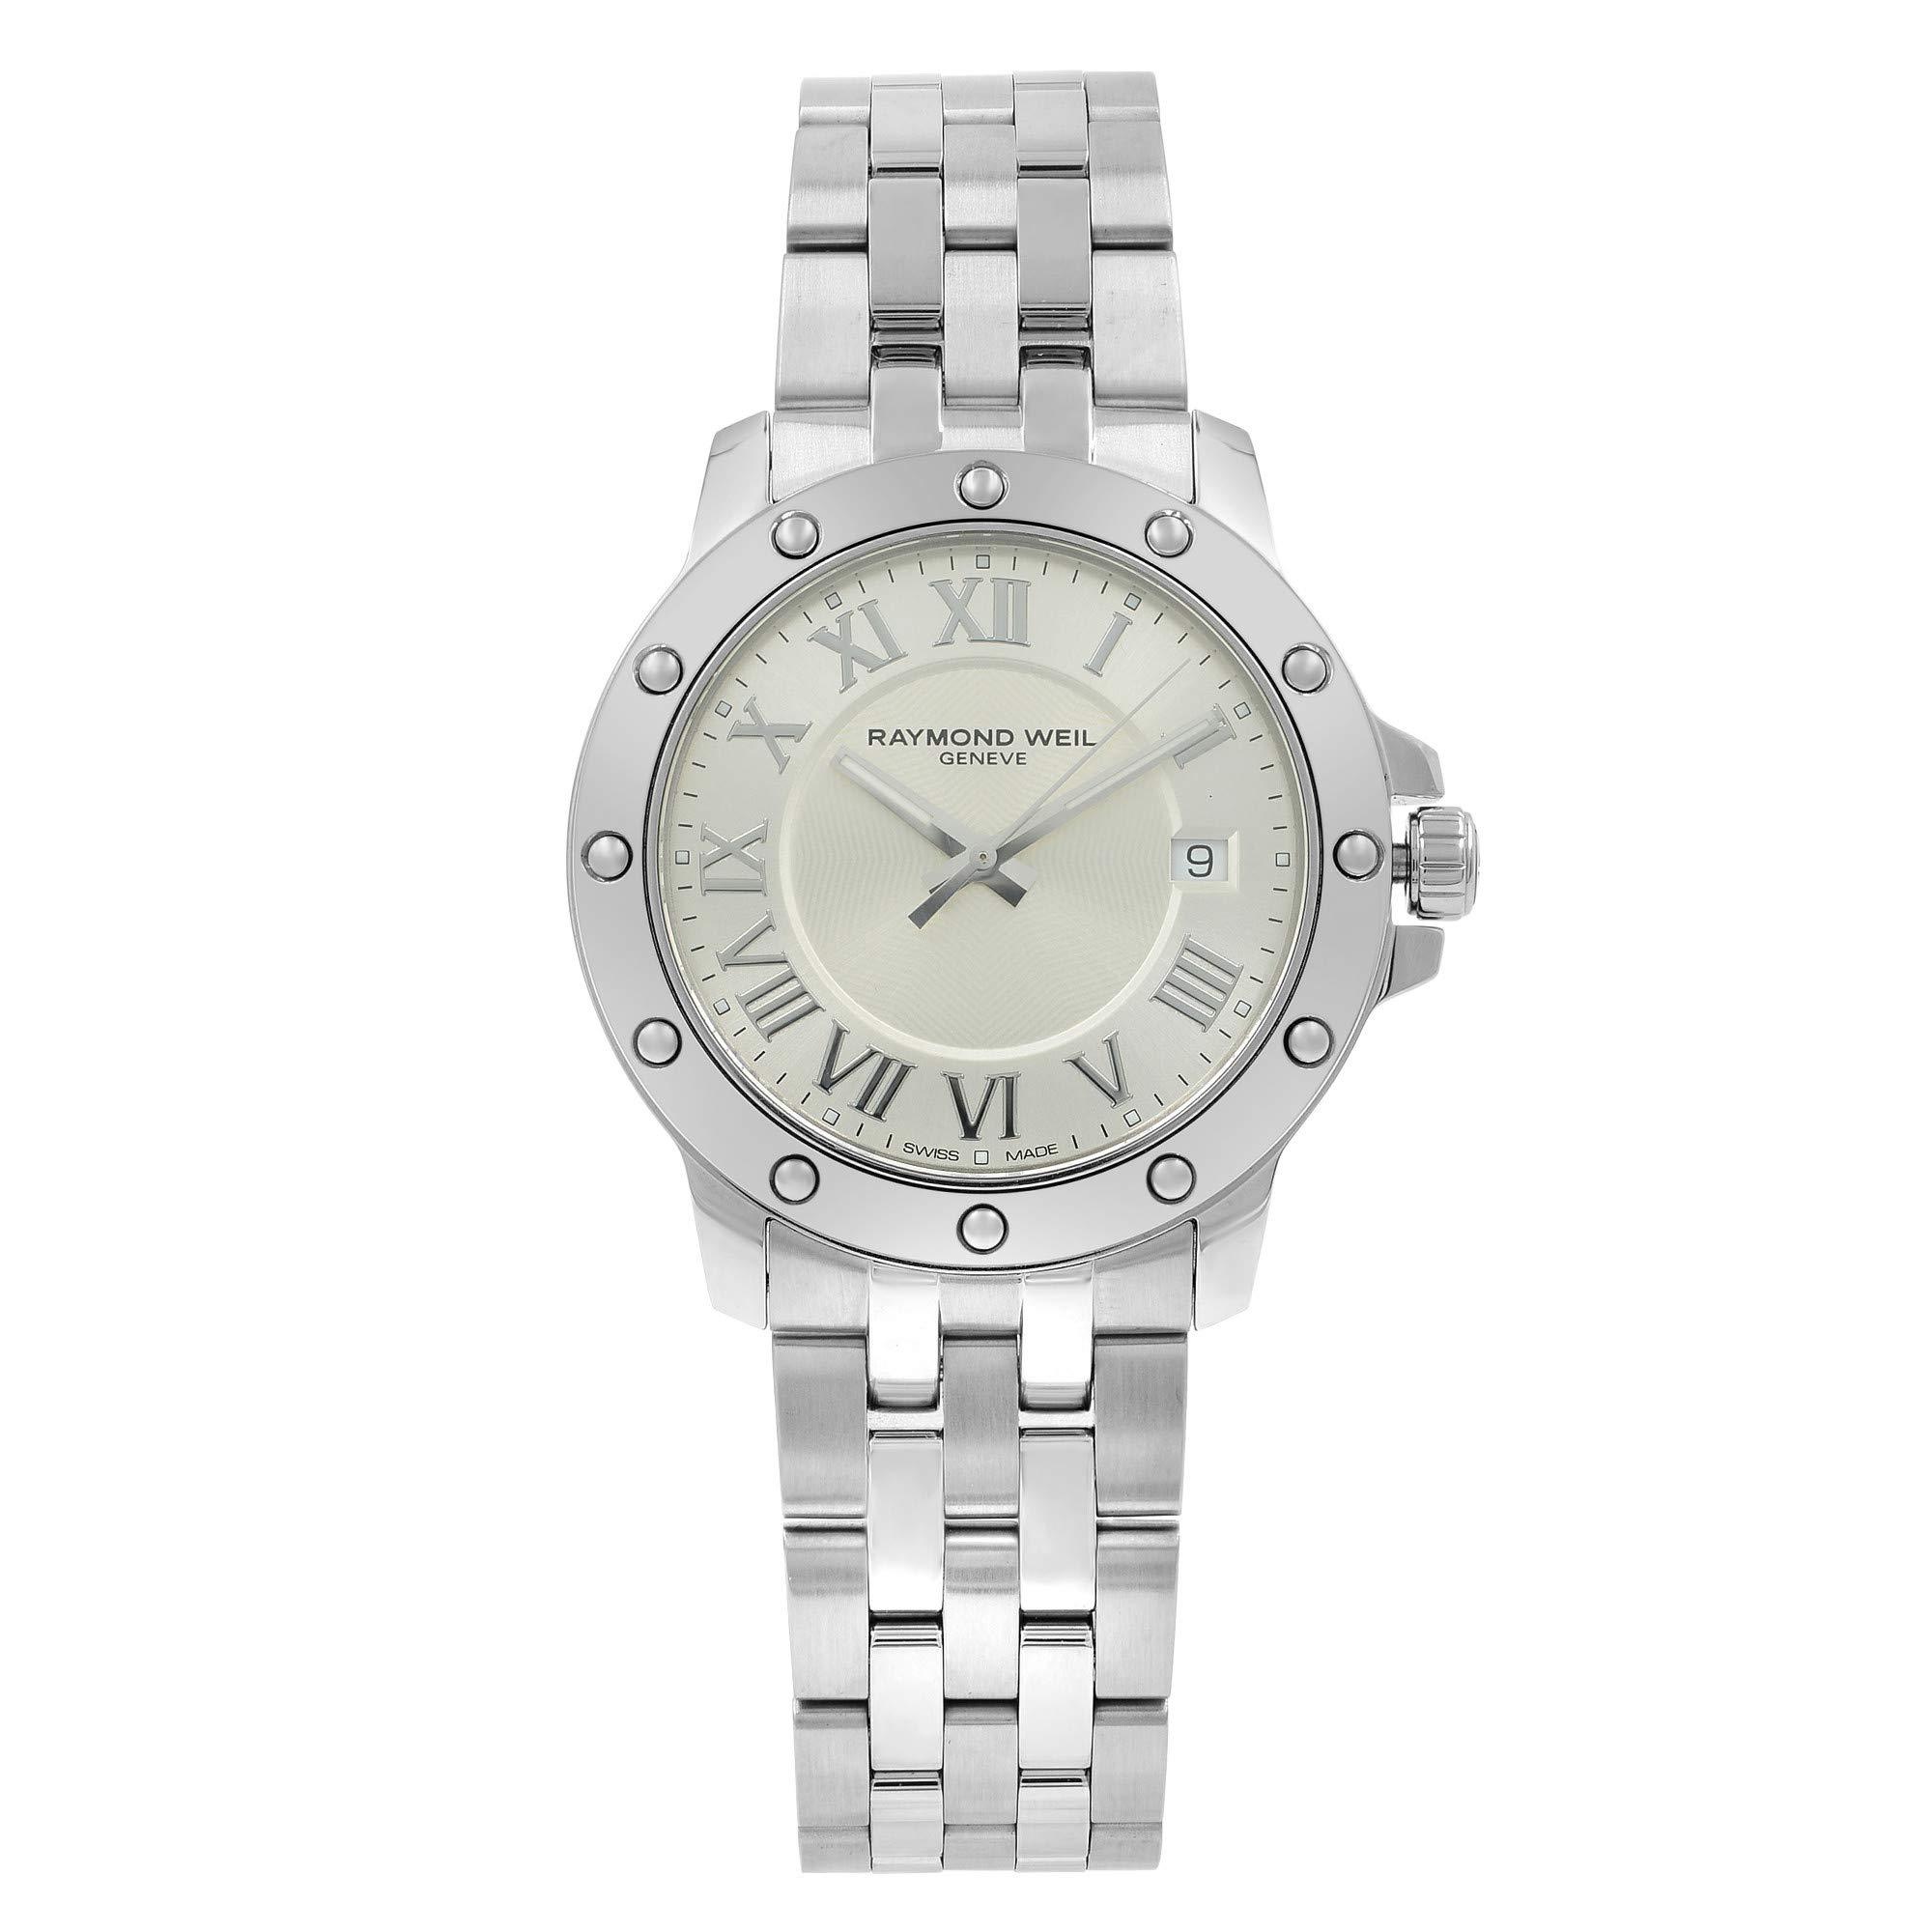 Raymond Weil Tango Quartz Male Watch 5599-ST-00658 (Certified Pre-Owned) by RAYMOND WEIL (Image #1)